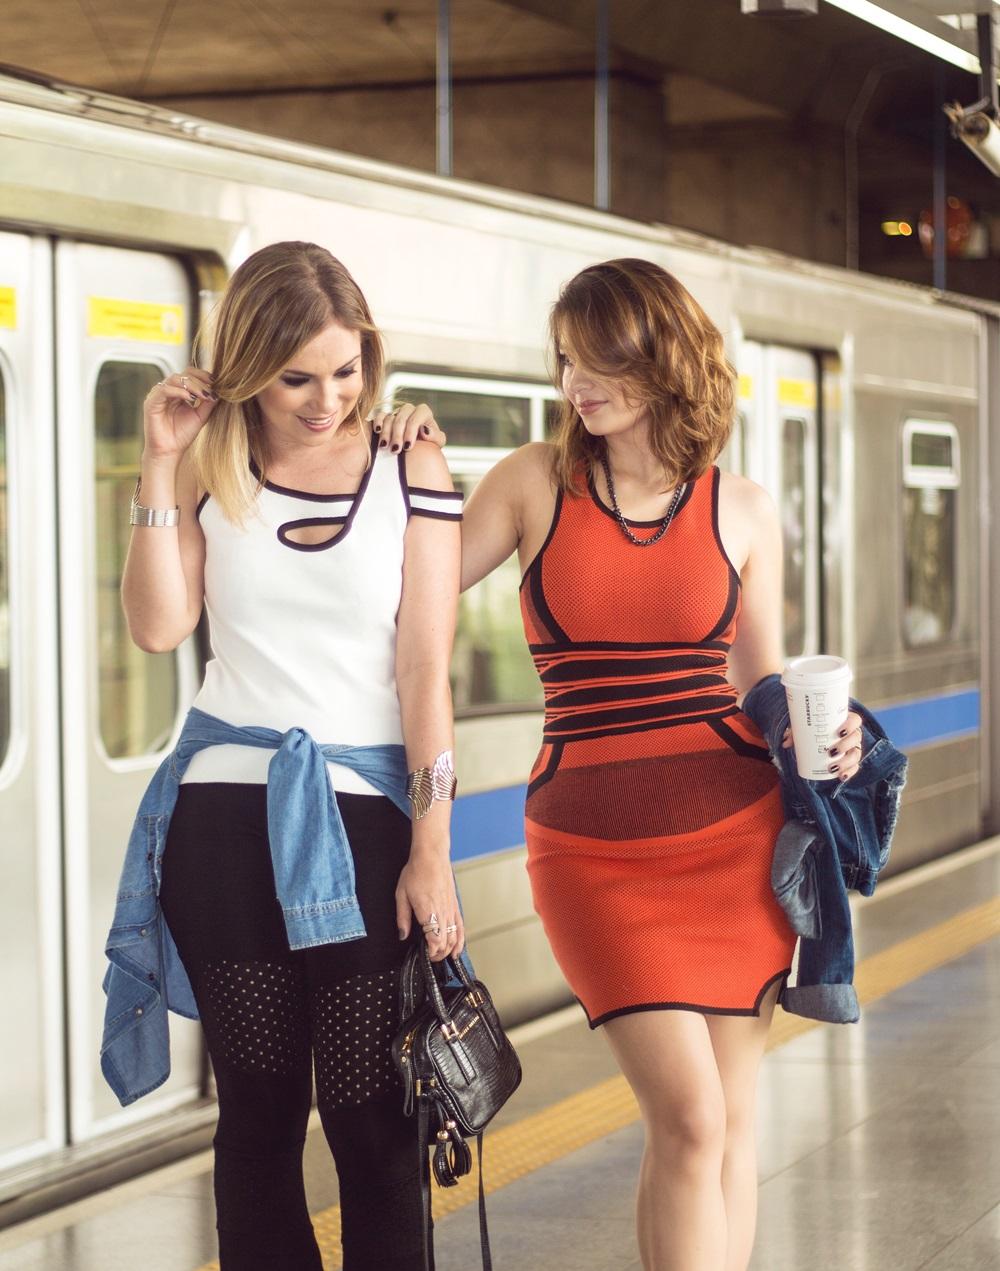 post-editorial-primart-street-style-look-metro-blog-vanduarte-10